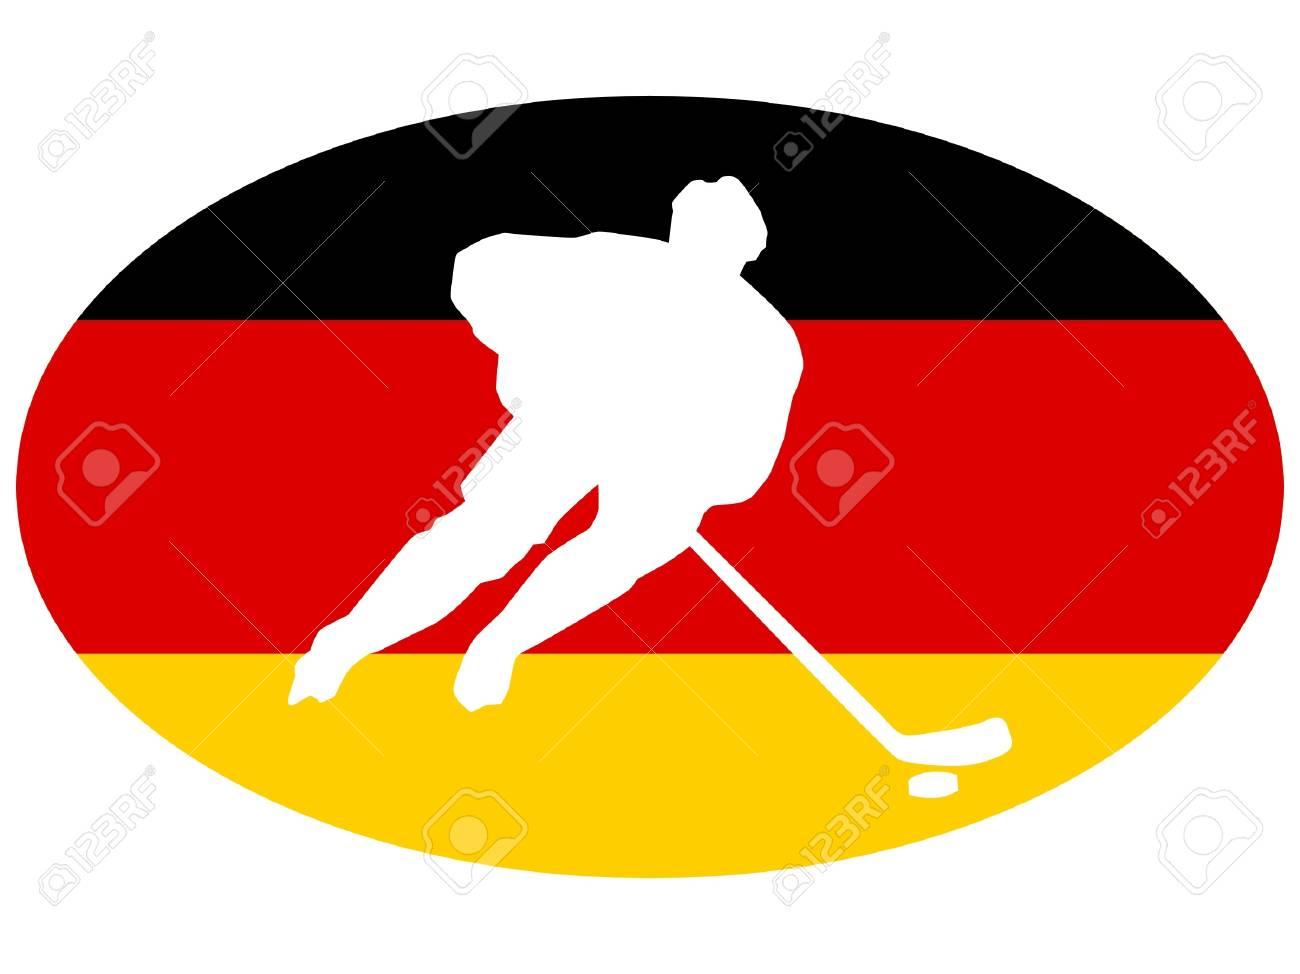 hockey colors of Germany Stock Vector - 11751441